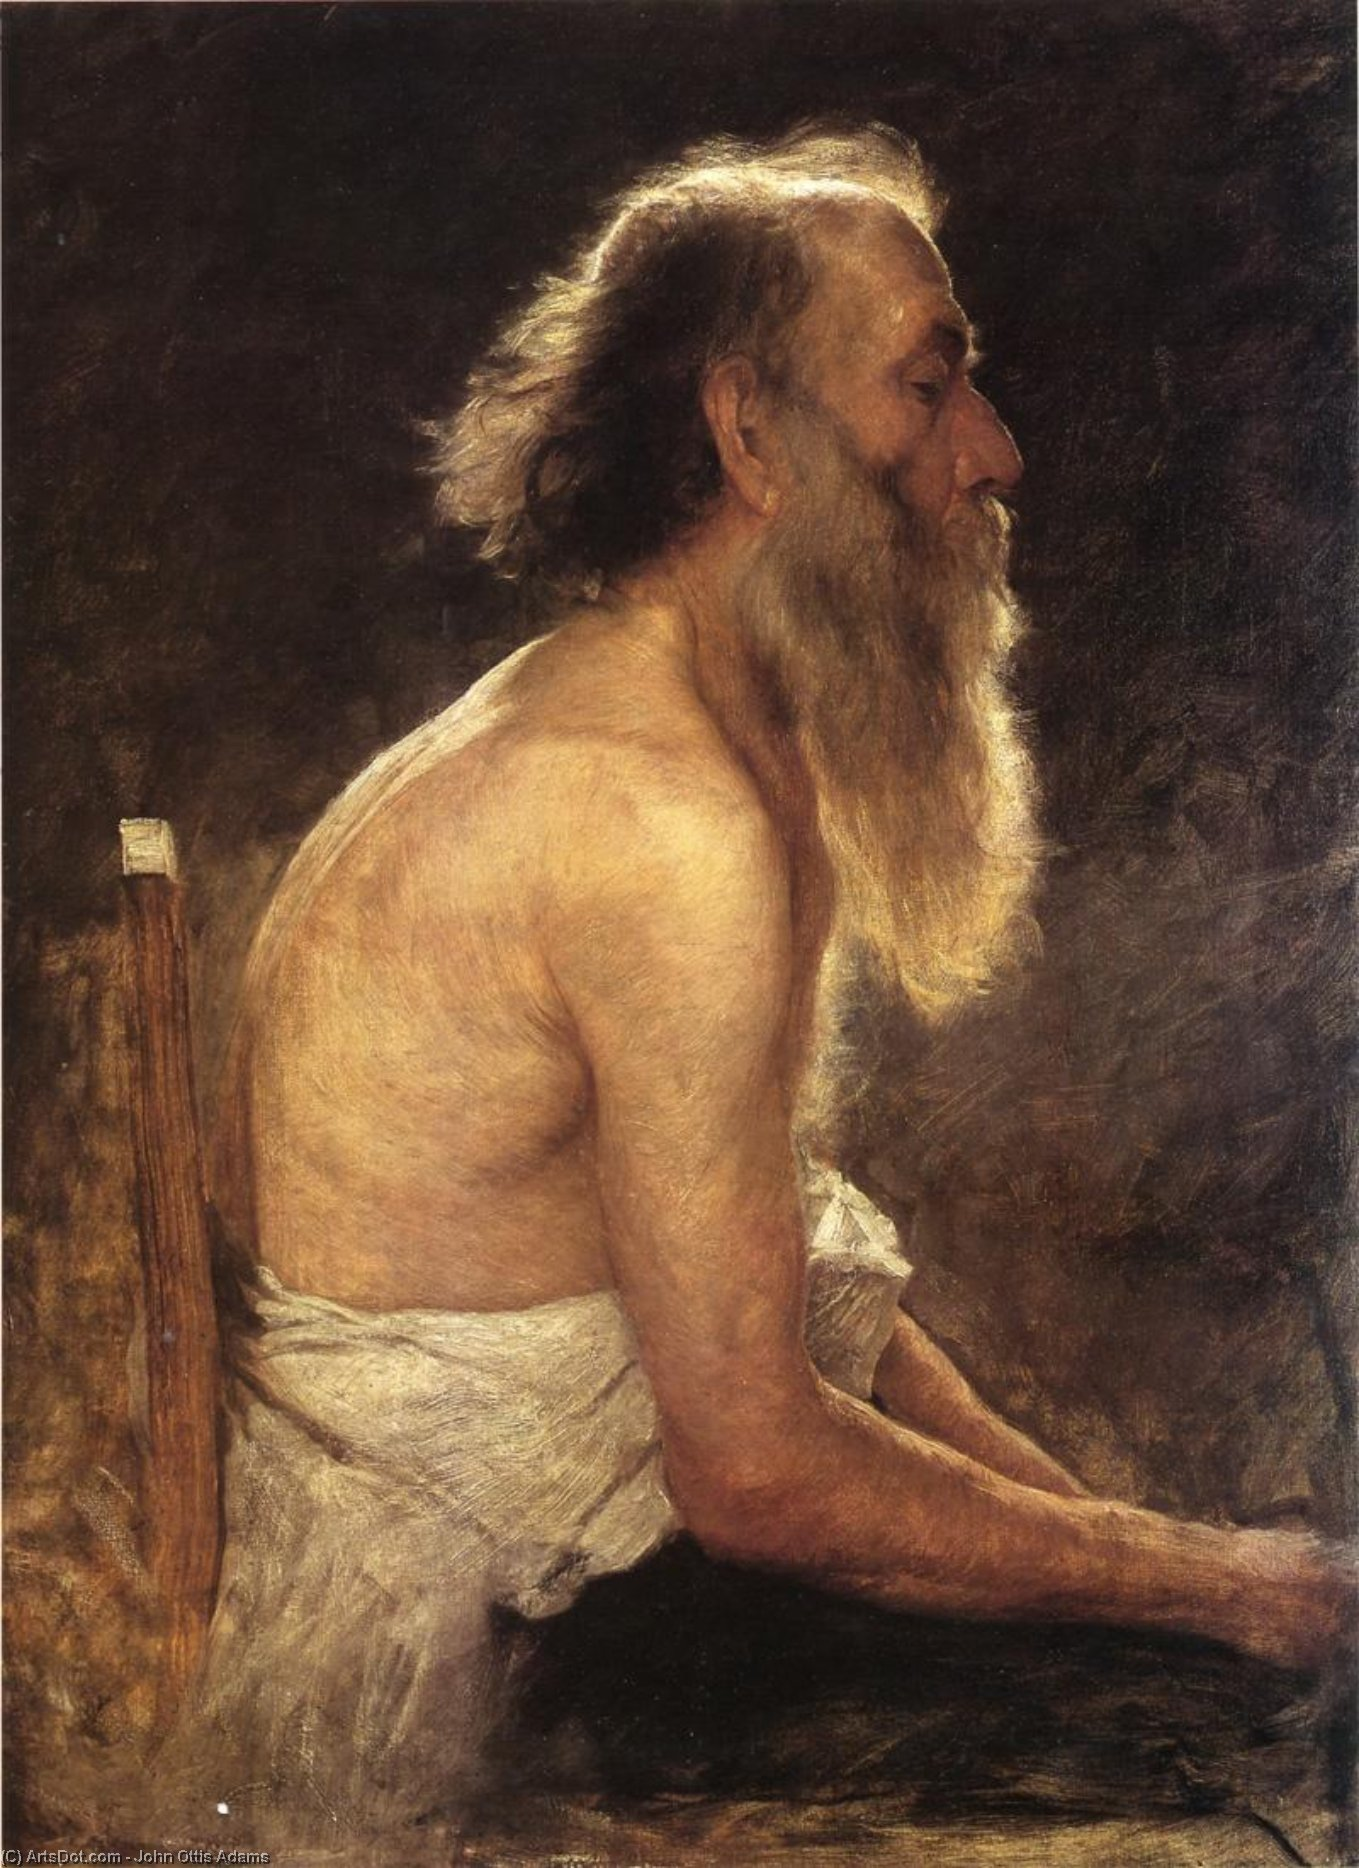 Wikioo.org - The Encyclopedia of Fine Arts - Painting, Artwork by John Ottis Adams - Half-Length Figure Study